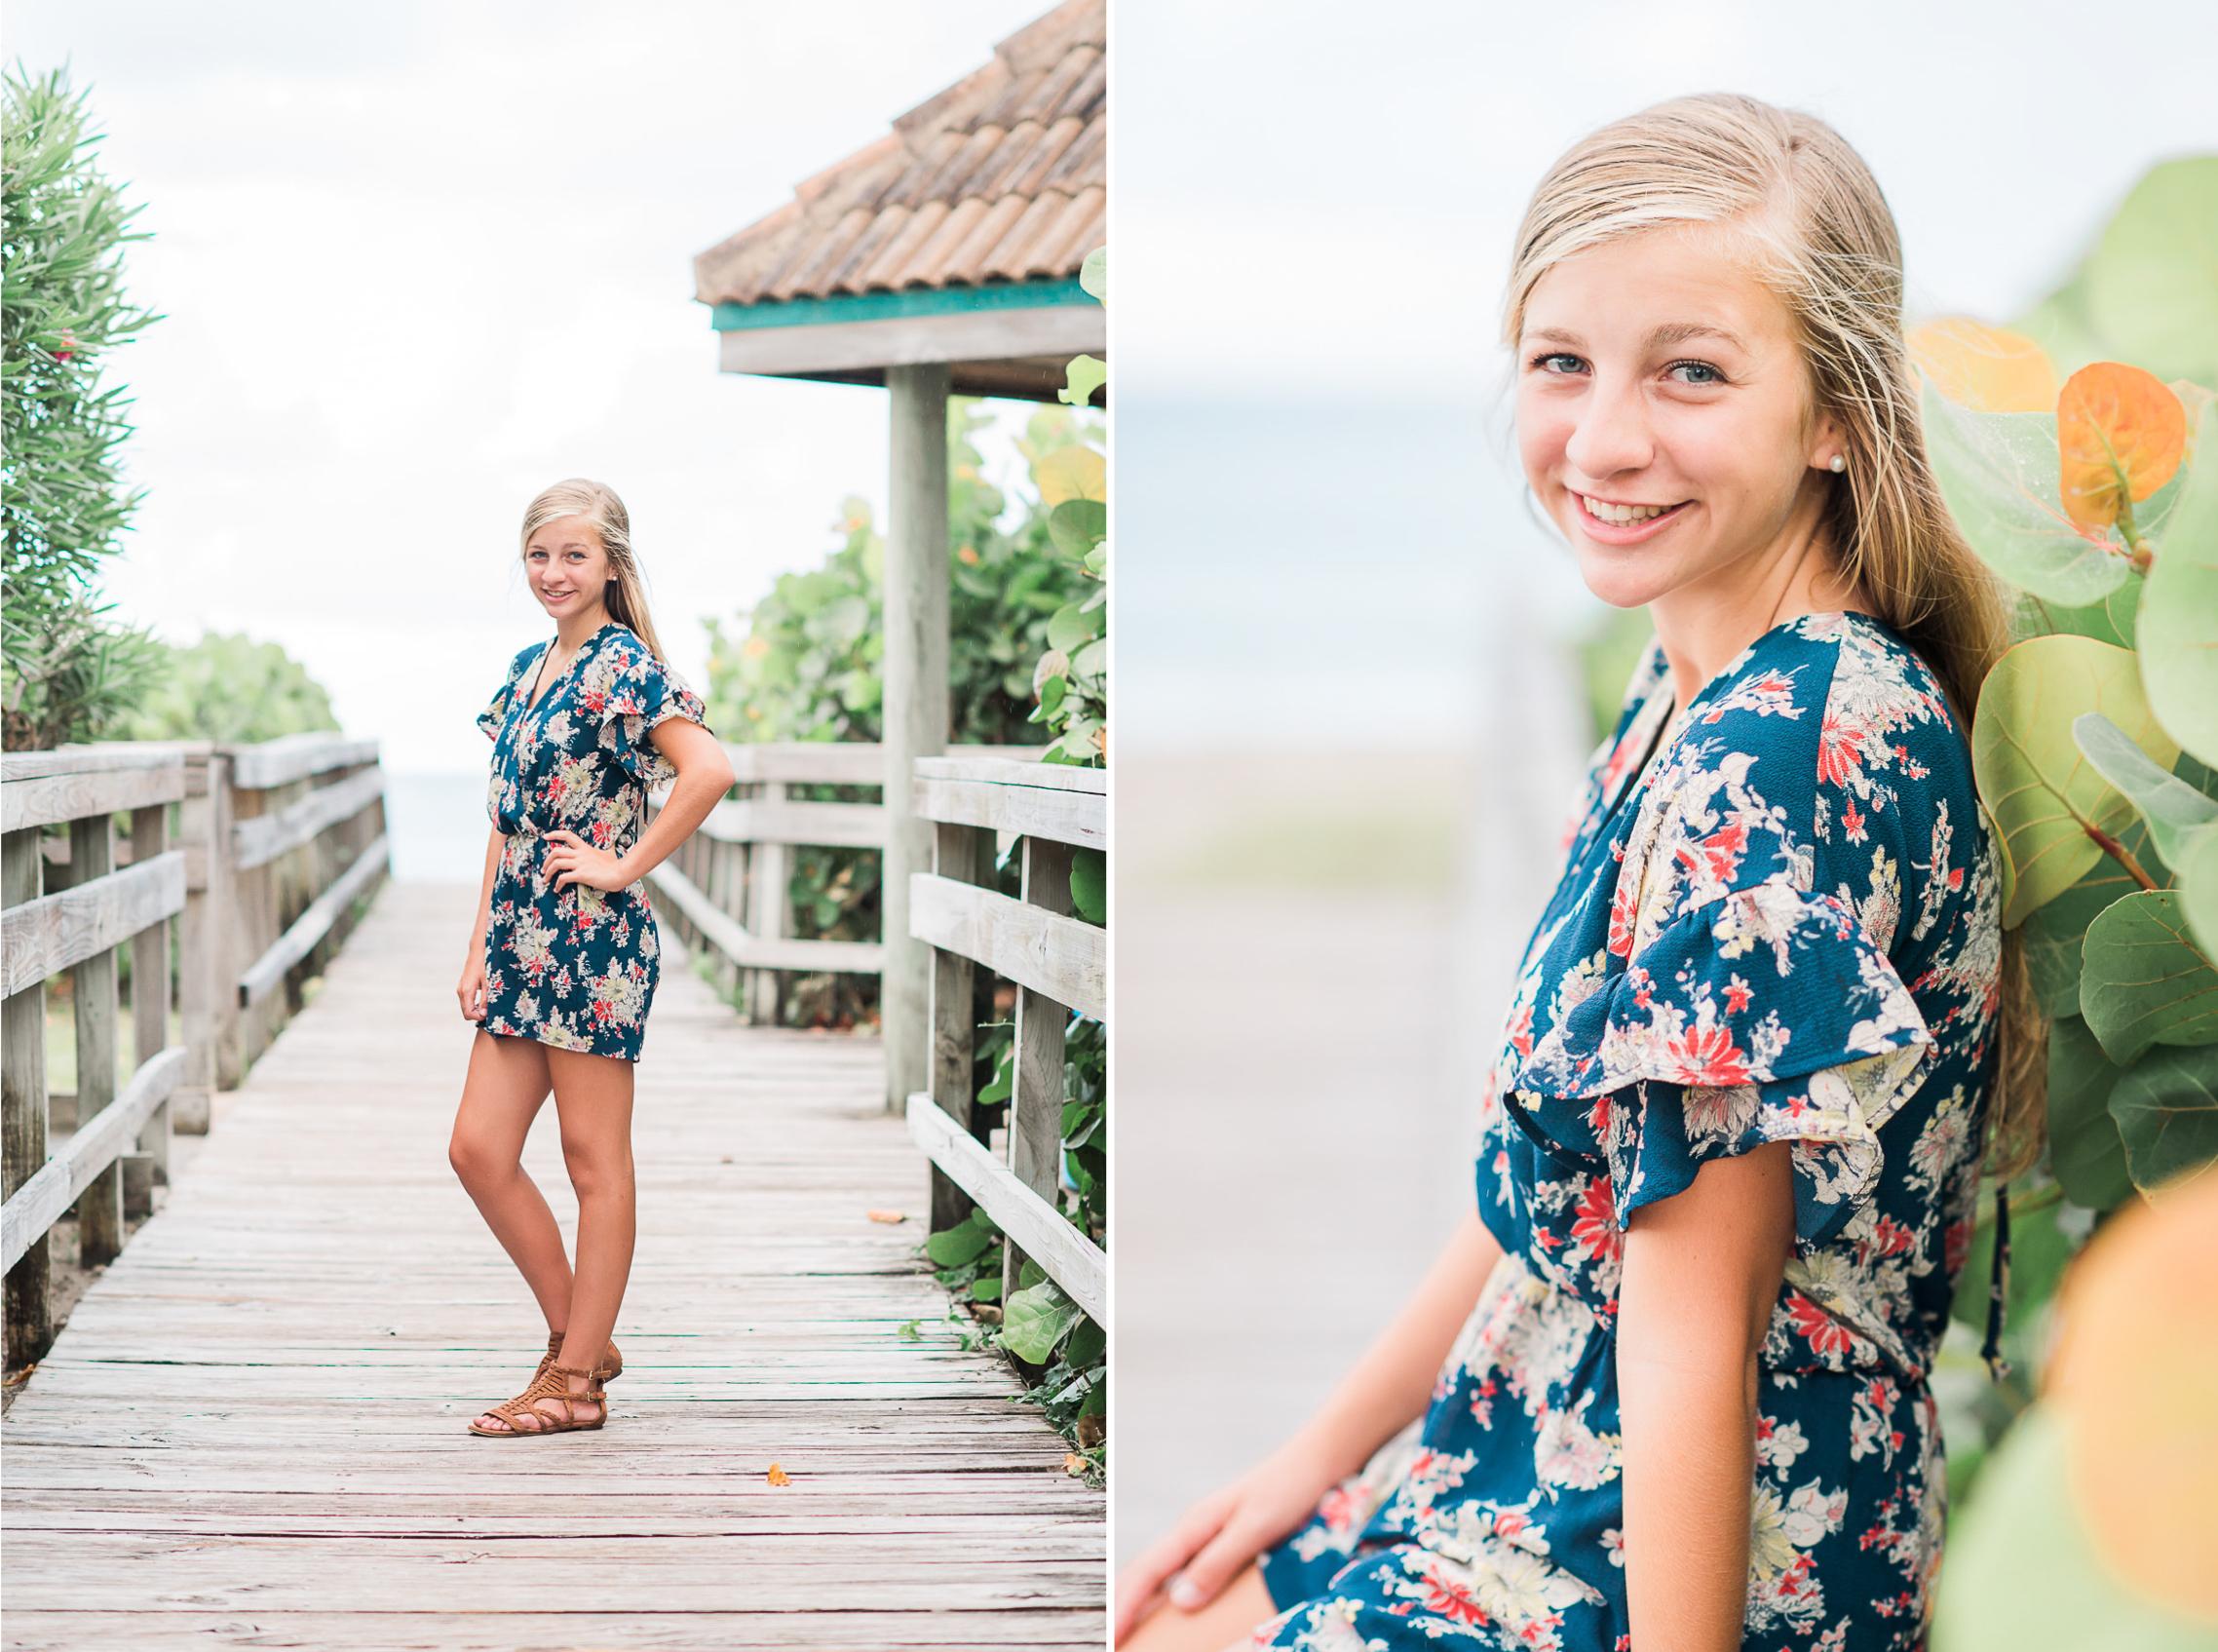 KateTaramykinStudios-West-Palm-Beach-Senior-Portraits-Katie-25.jpg